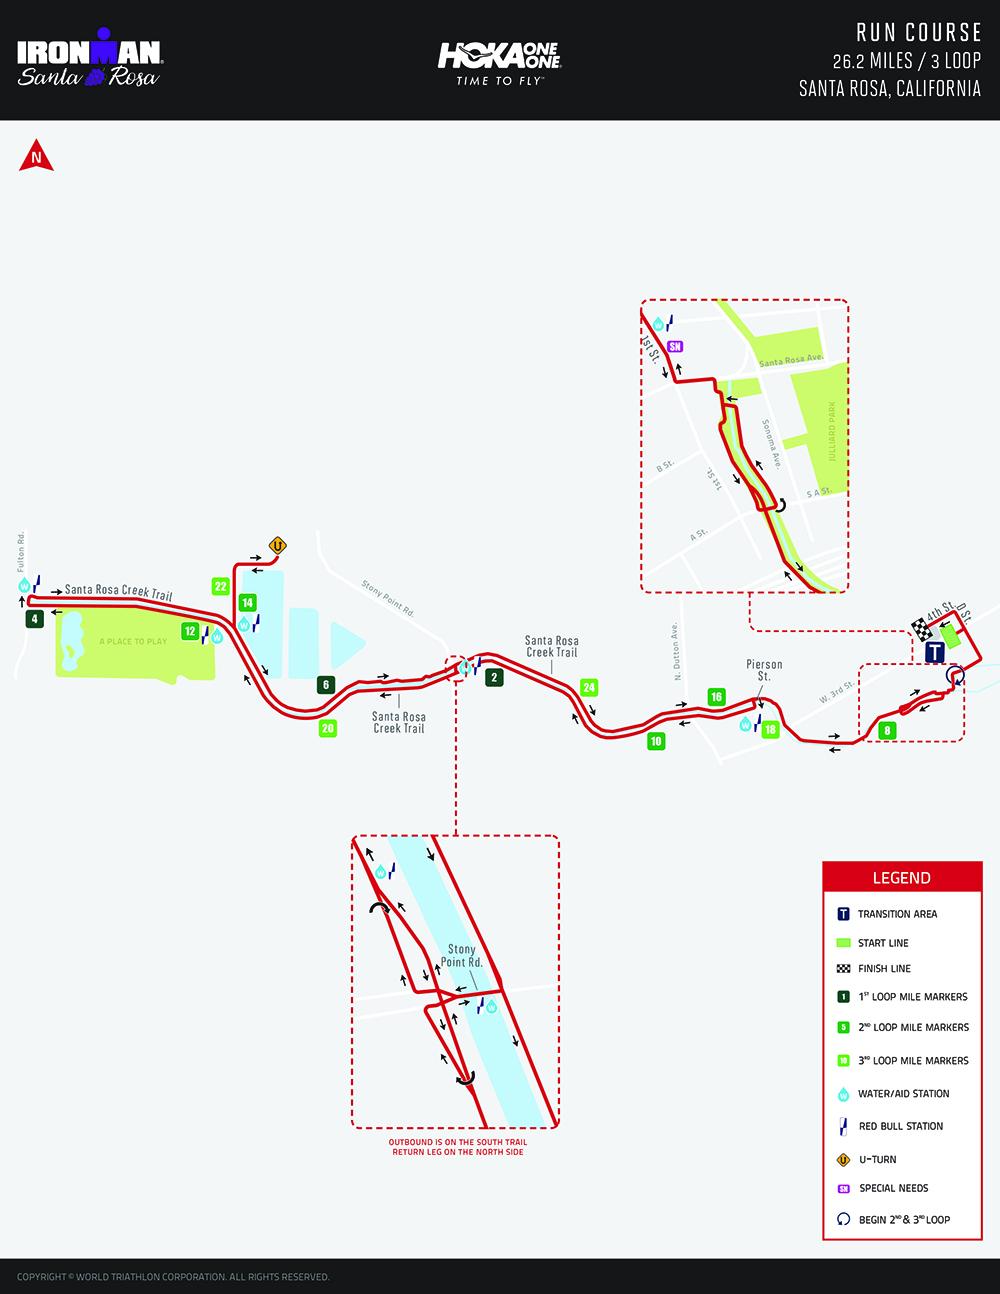 RUNSmallim santarosa19 coursemap run 41119 cc web-1.jpg